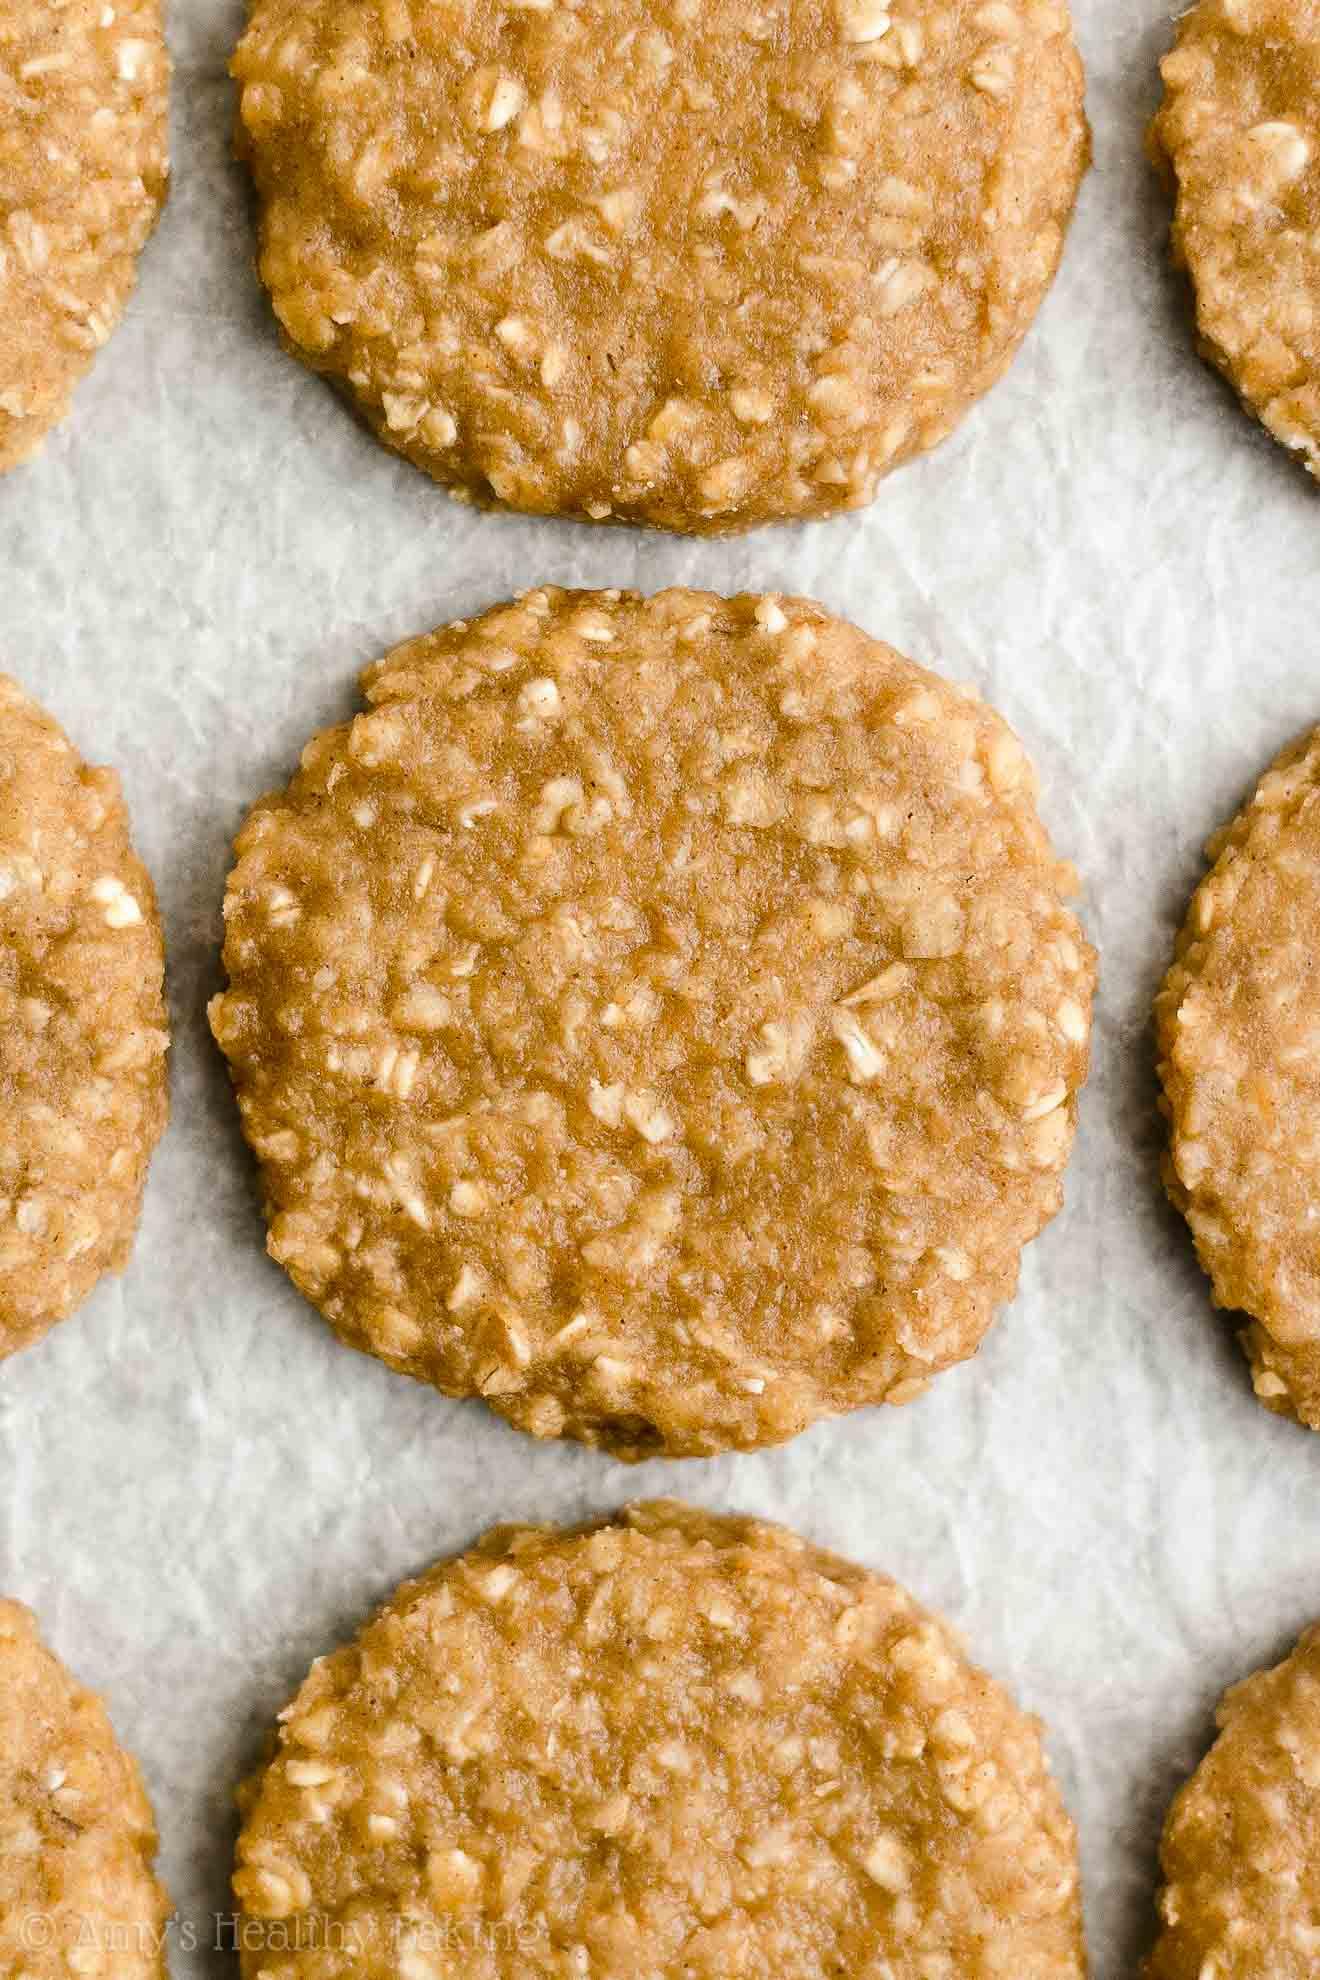 Best Easy Healthy Flourless Vegan Peanut Butter Oatmeal Breakfast Cookies